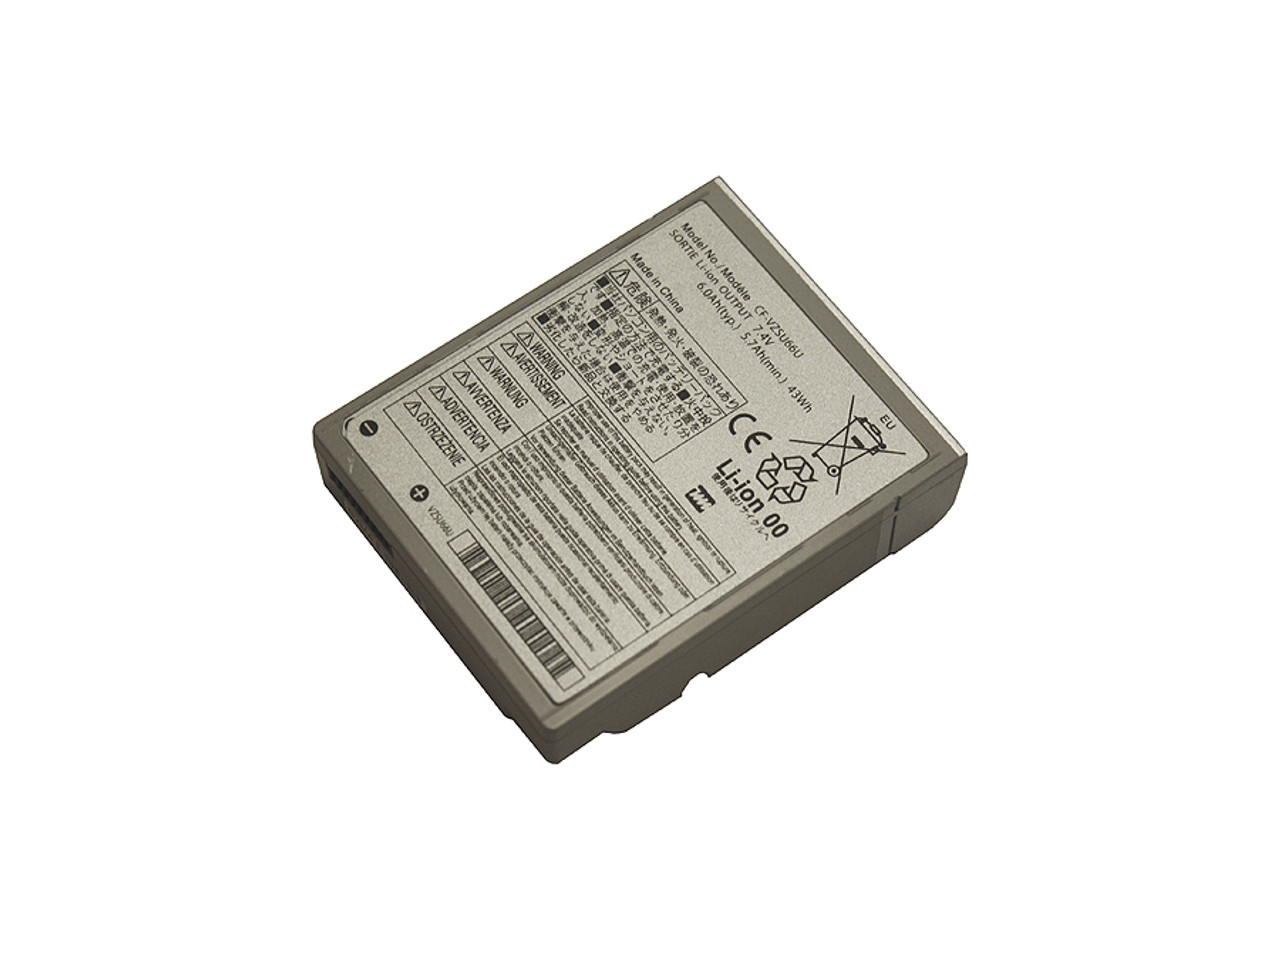 Replacement Battery for PANASONIC Toughbook CF-C1, CF-C1 MK1